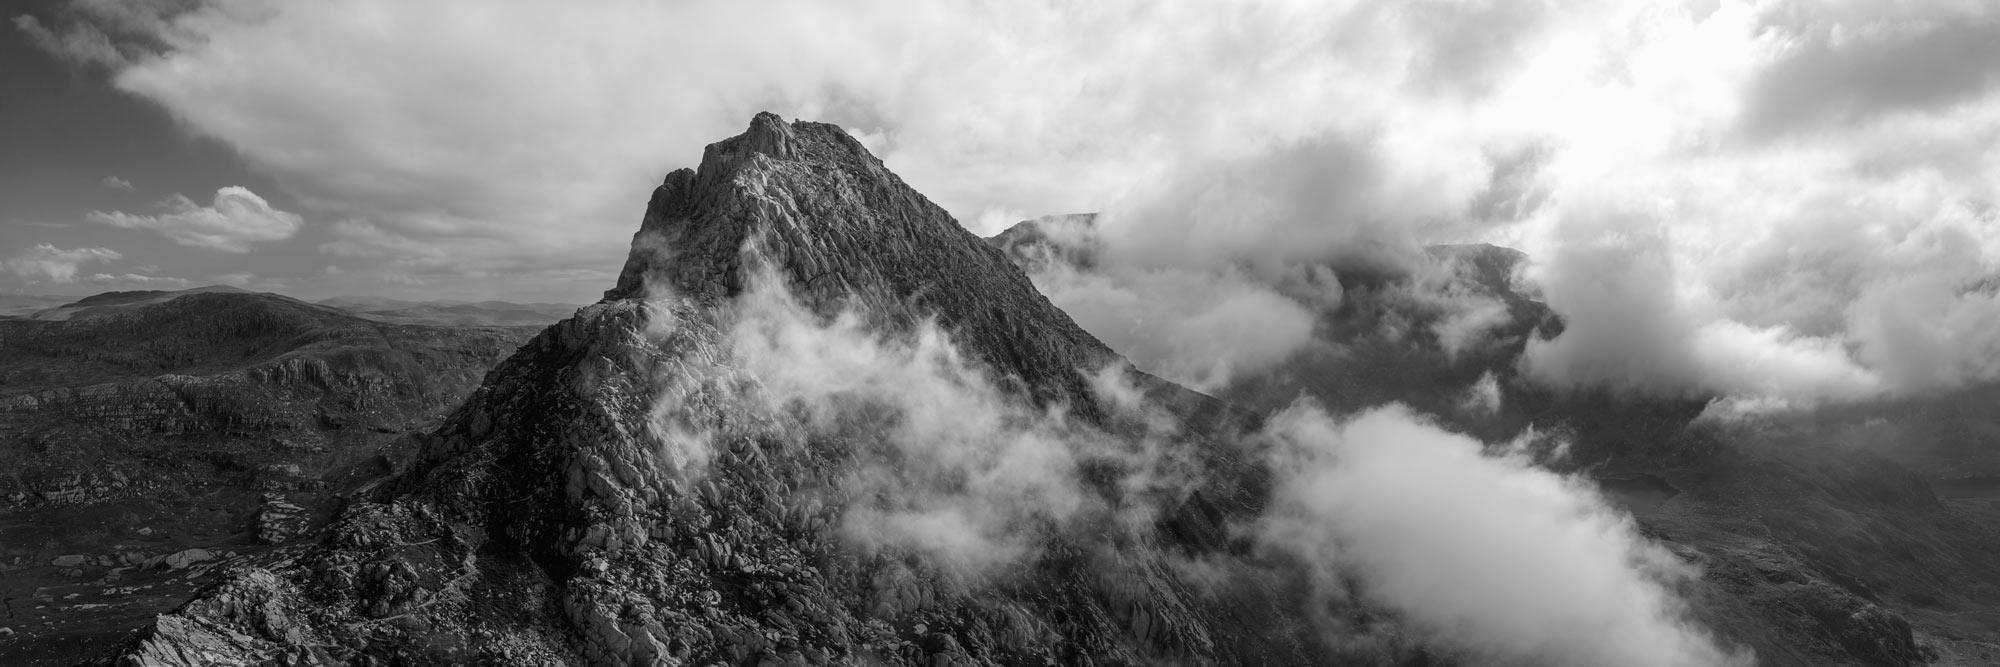 Snowdonia national park panoramic print